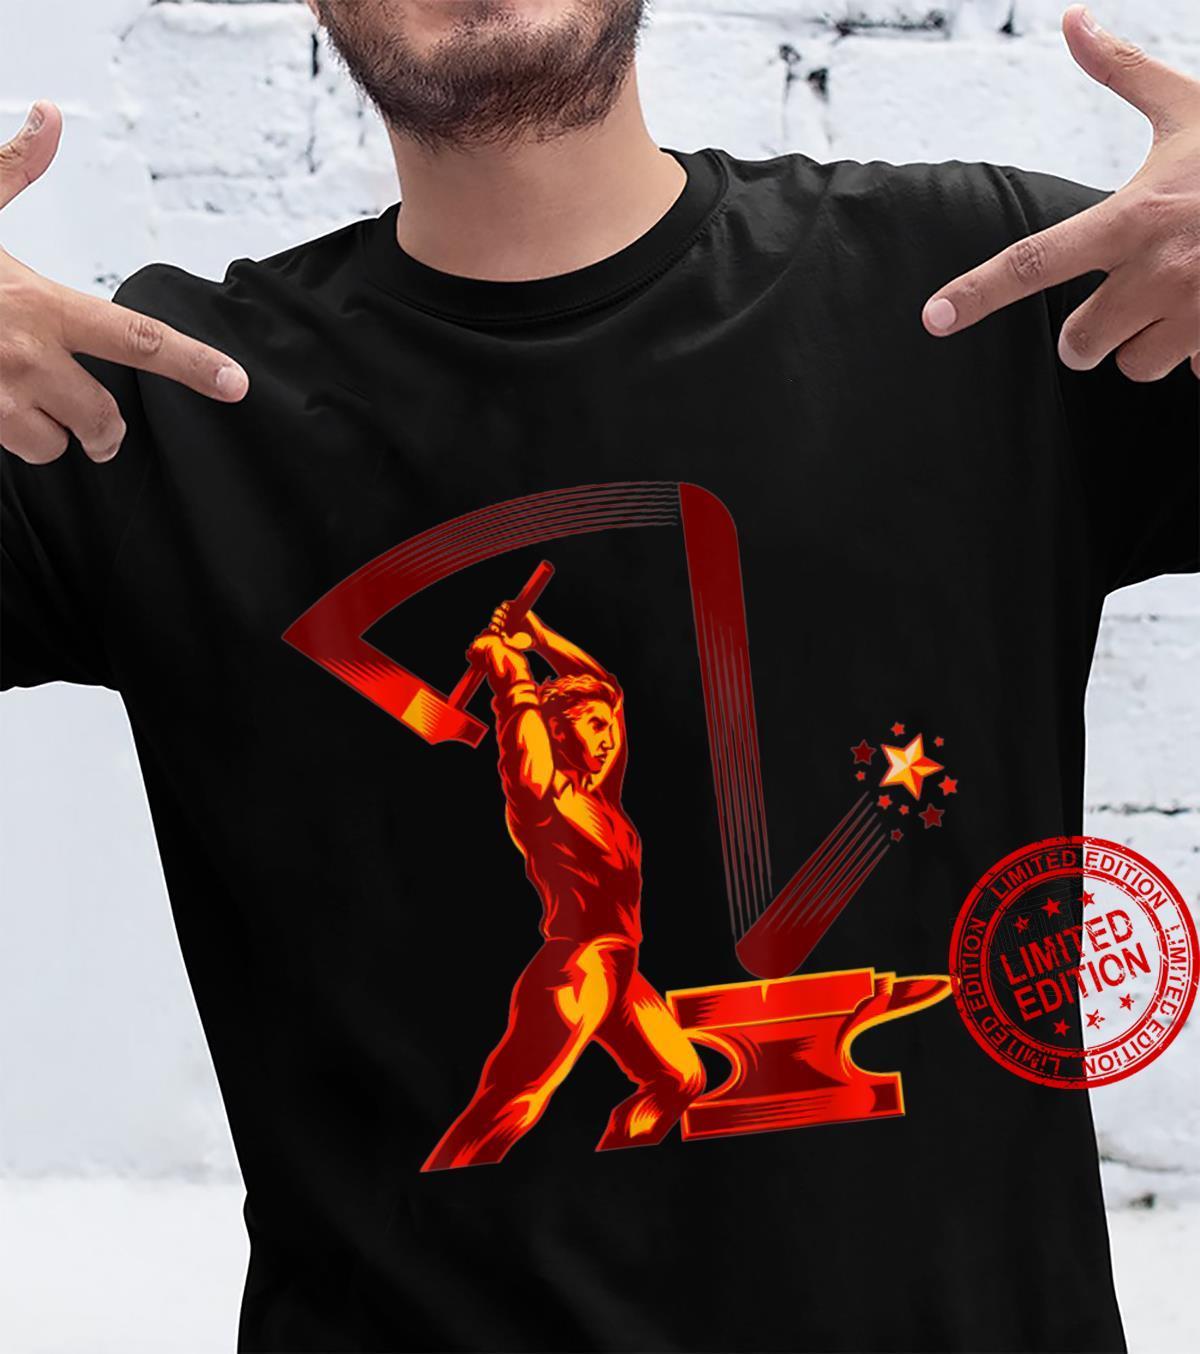 Worker and Labor SOVI8 Vintage Propaganda. Shirt